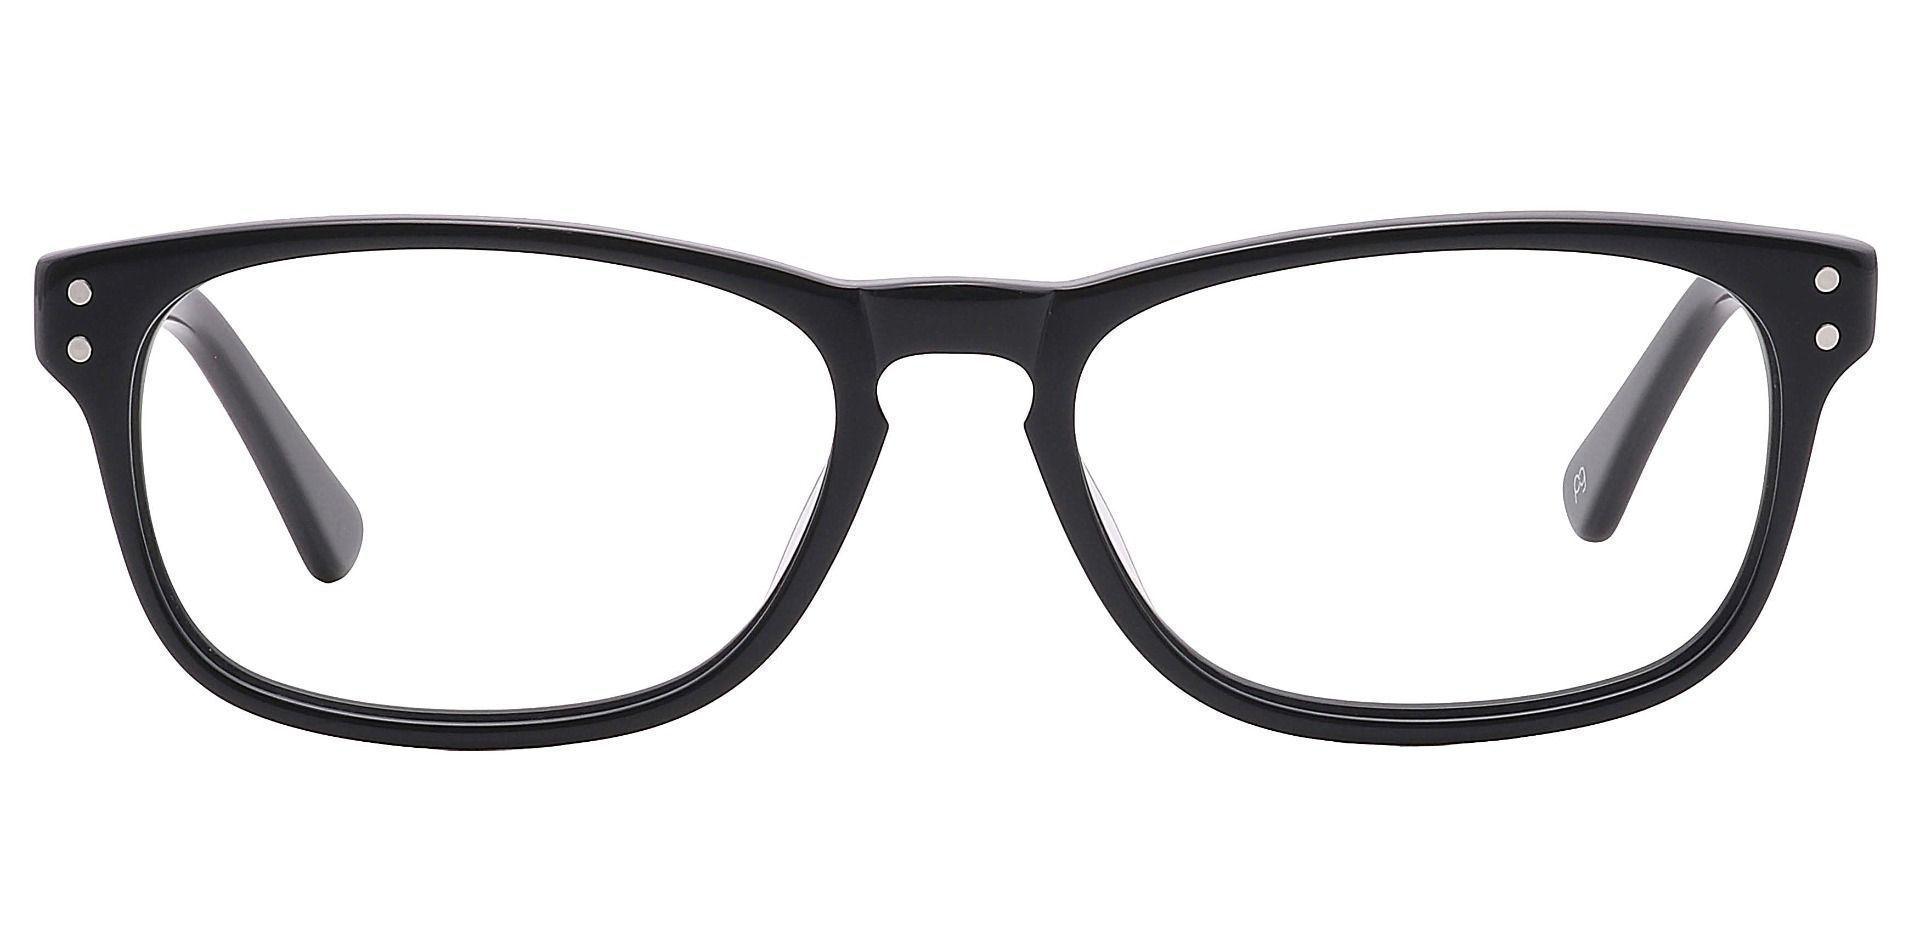 Morris Rectangle Progressive Glasses - Black